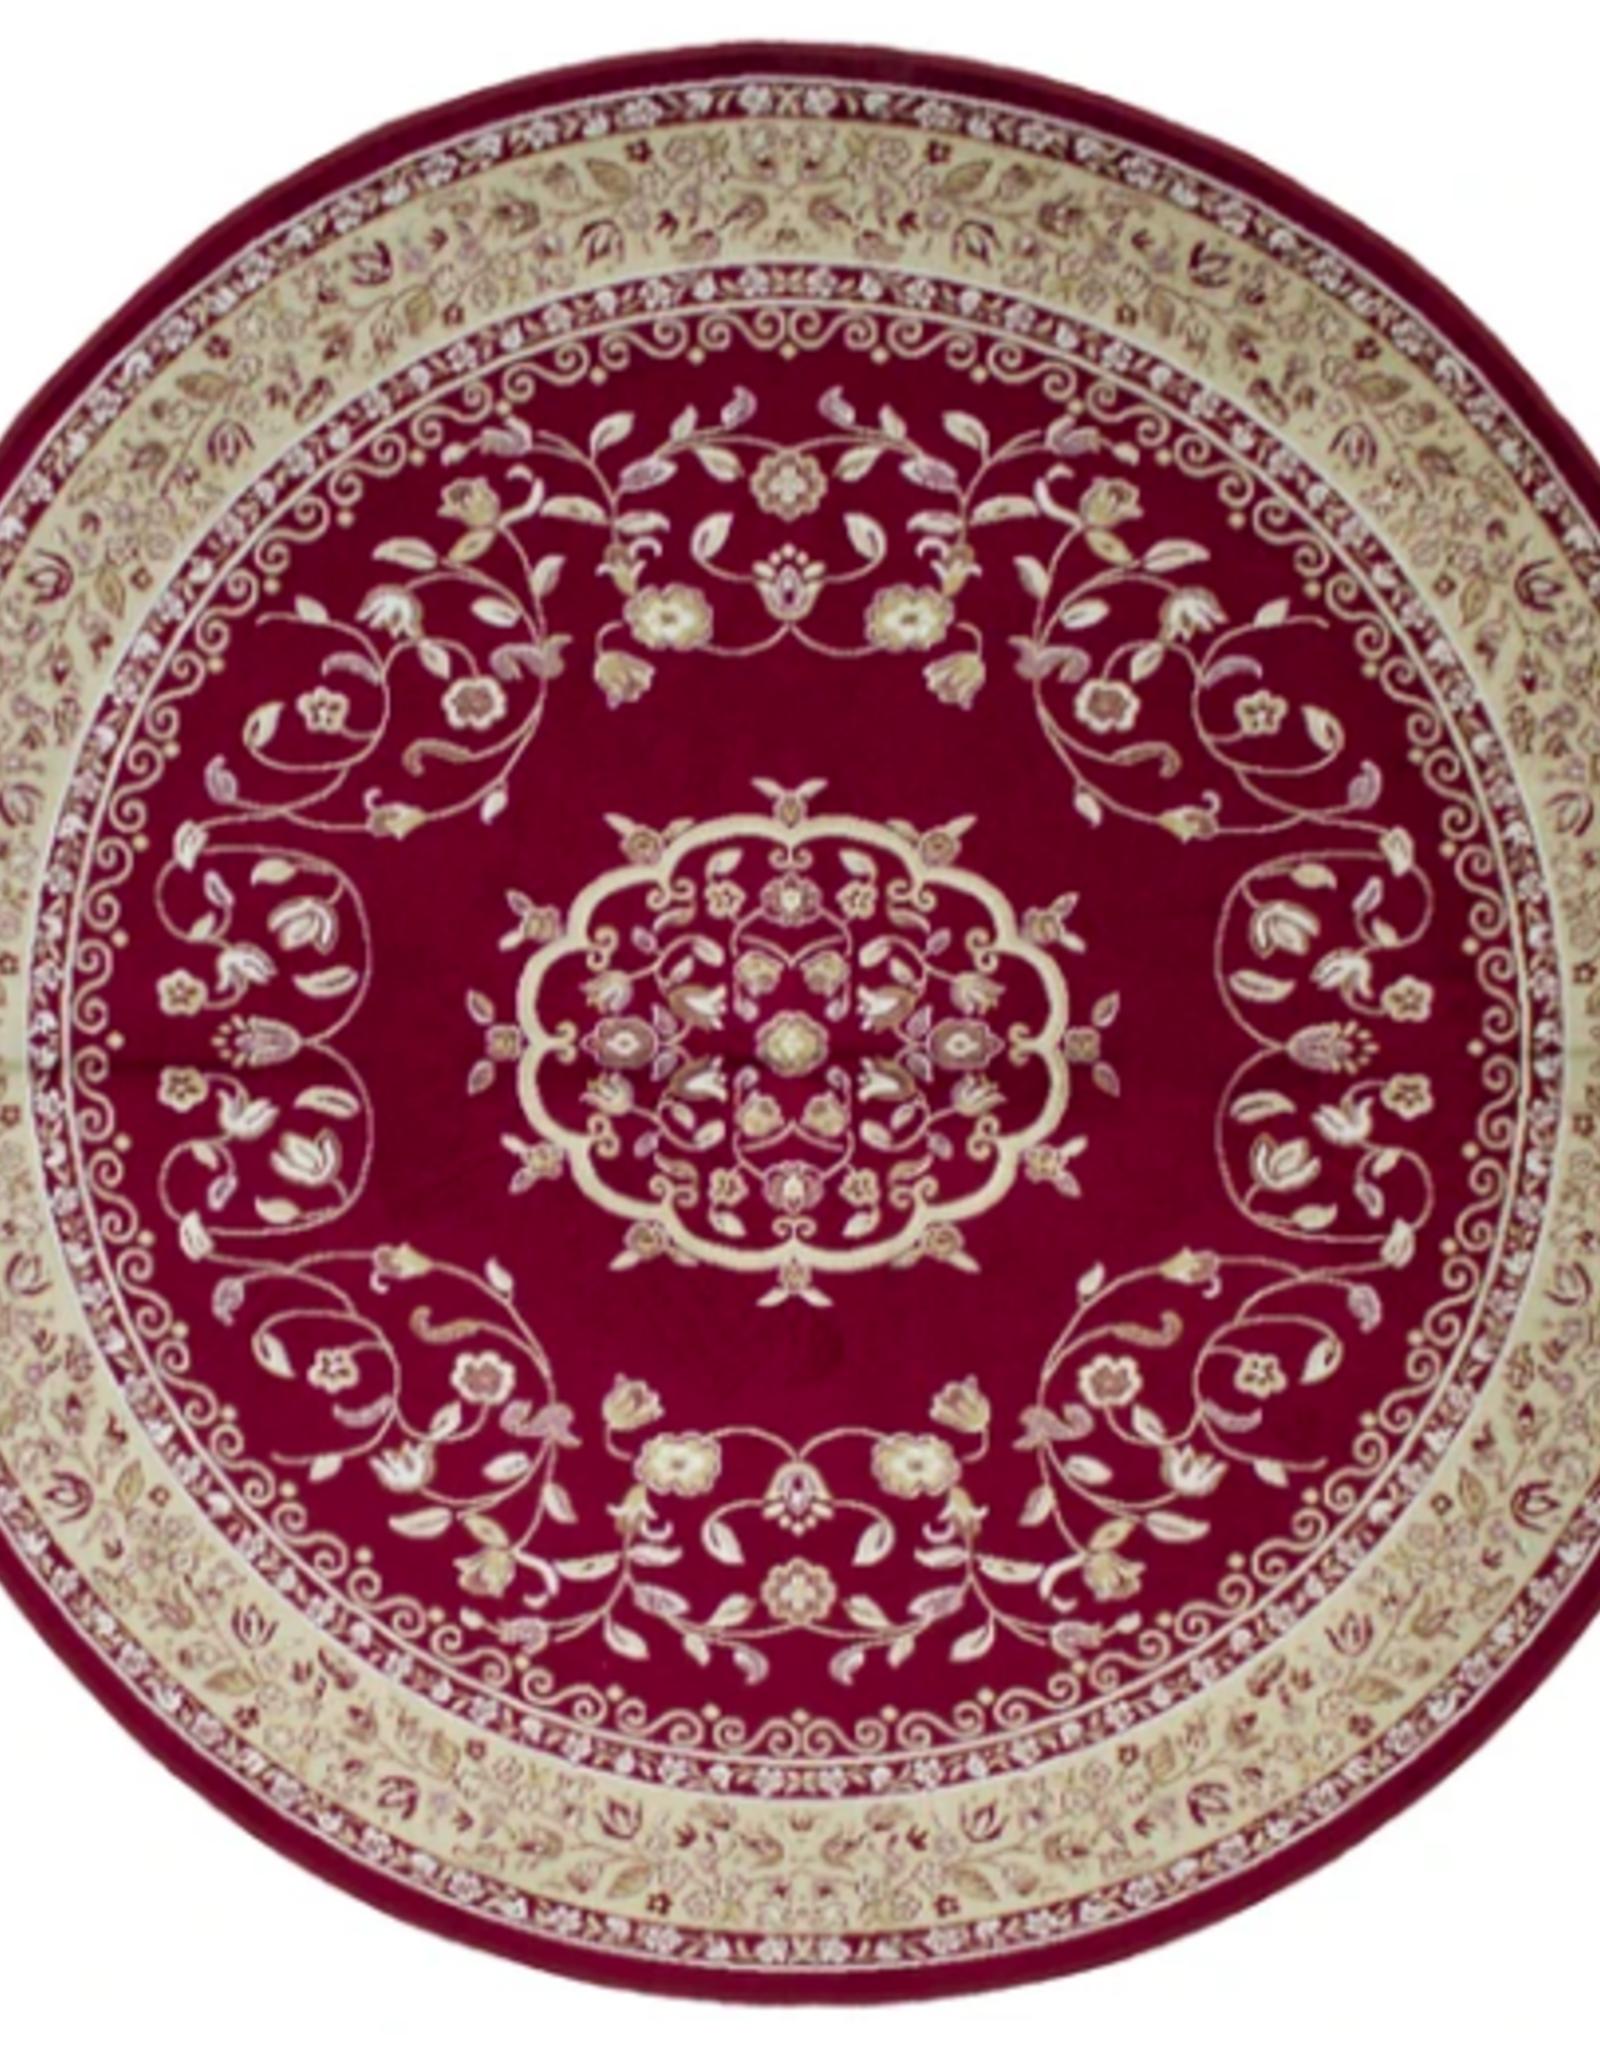 Rugs Avocado Artificial Silk 4'6 Round Sarook Red